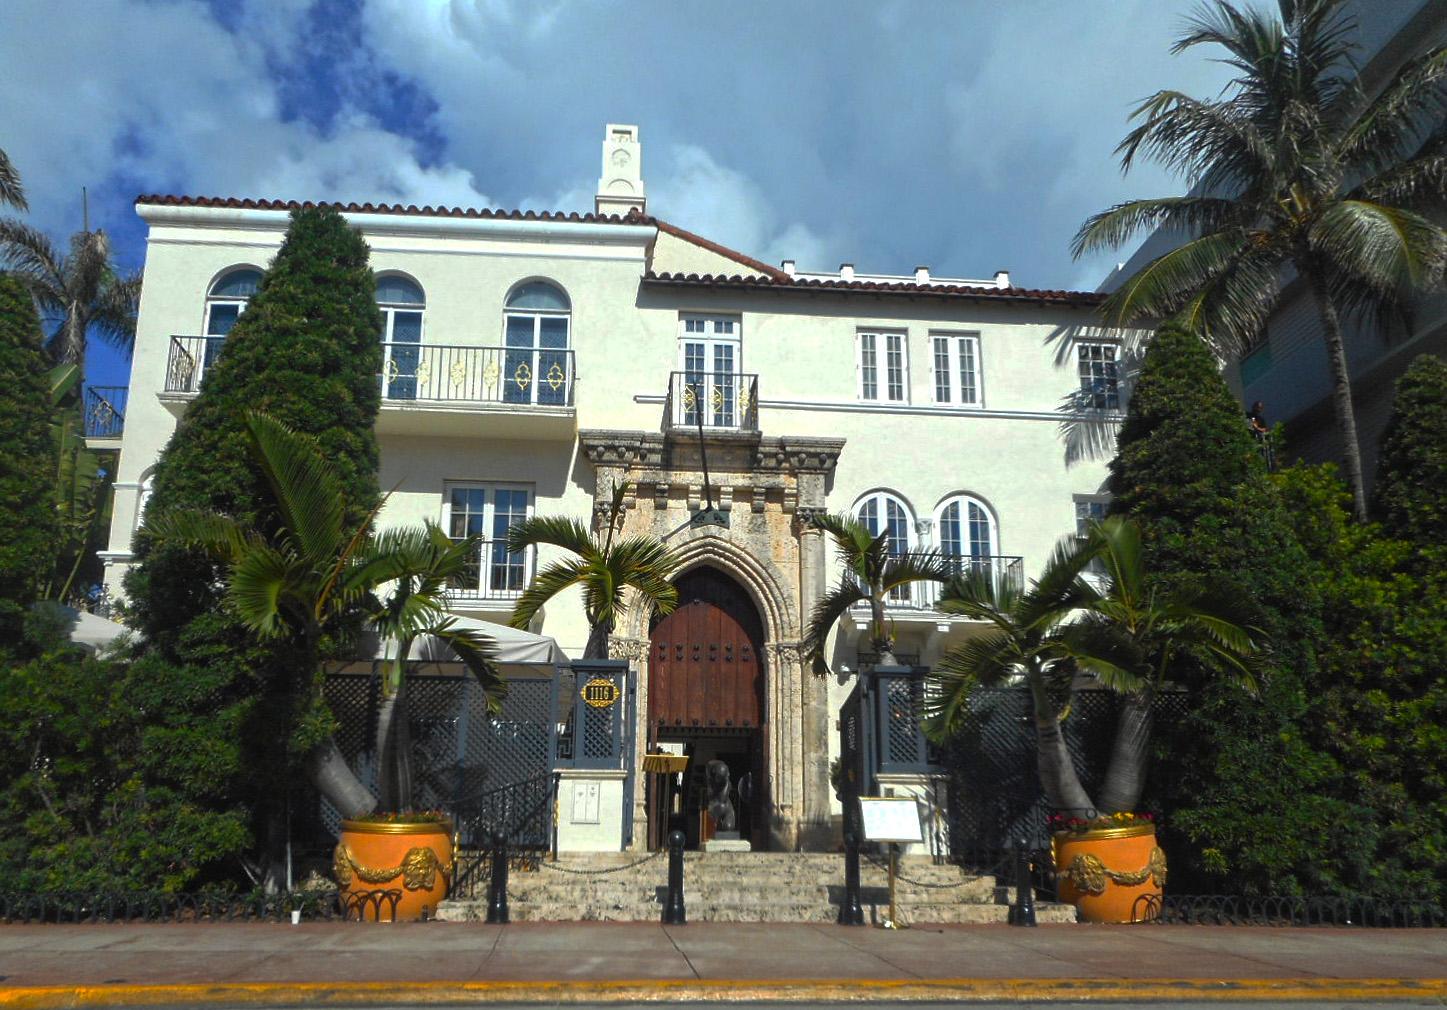 File:Versace mansion - casa casuarina.jpg - Wikimedia Commons